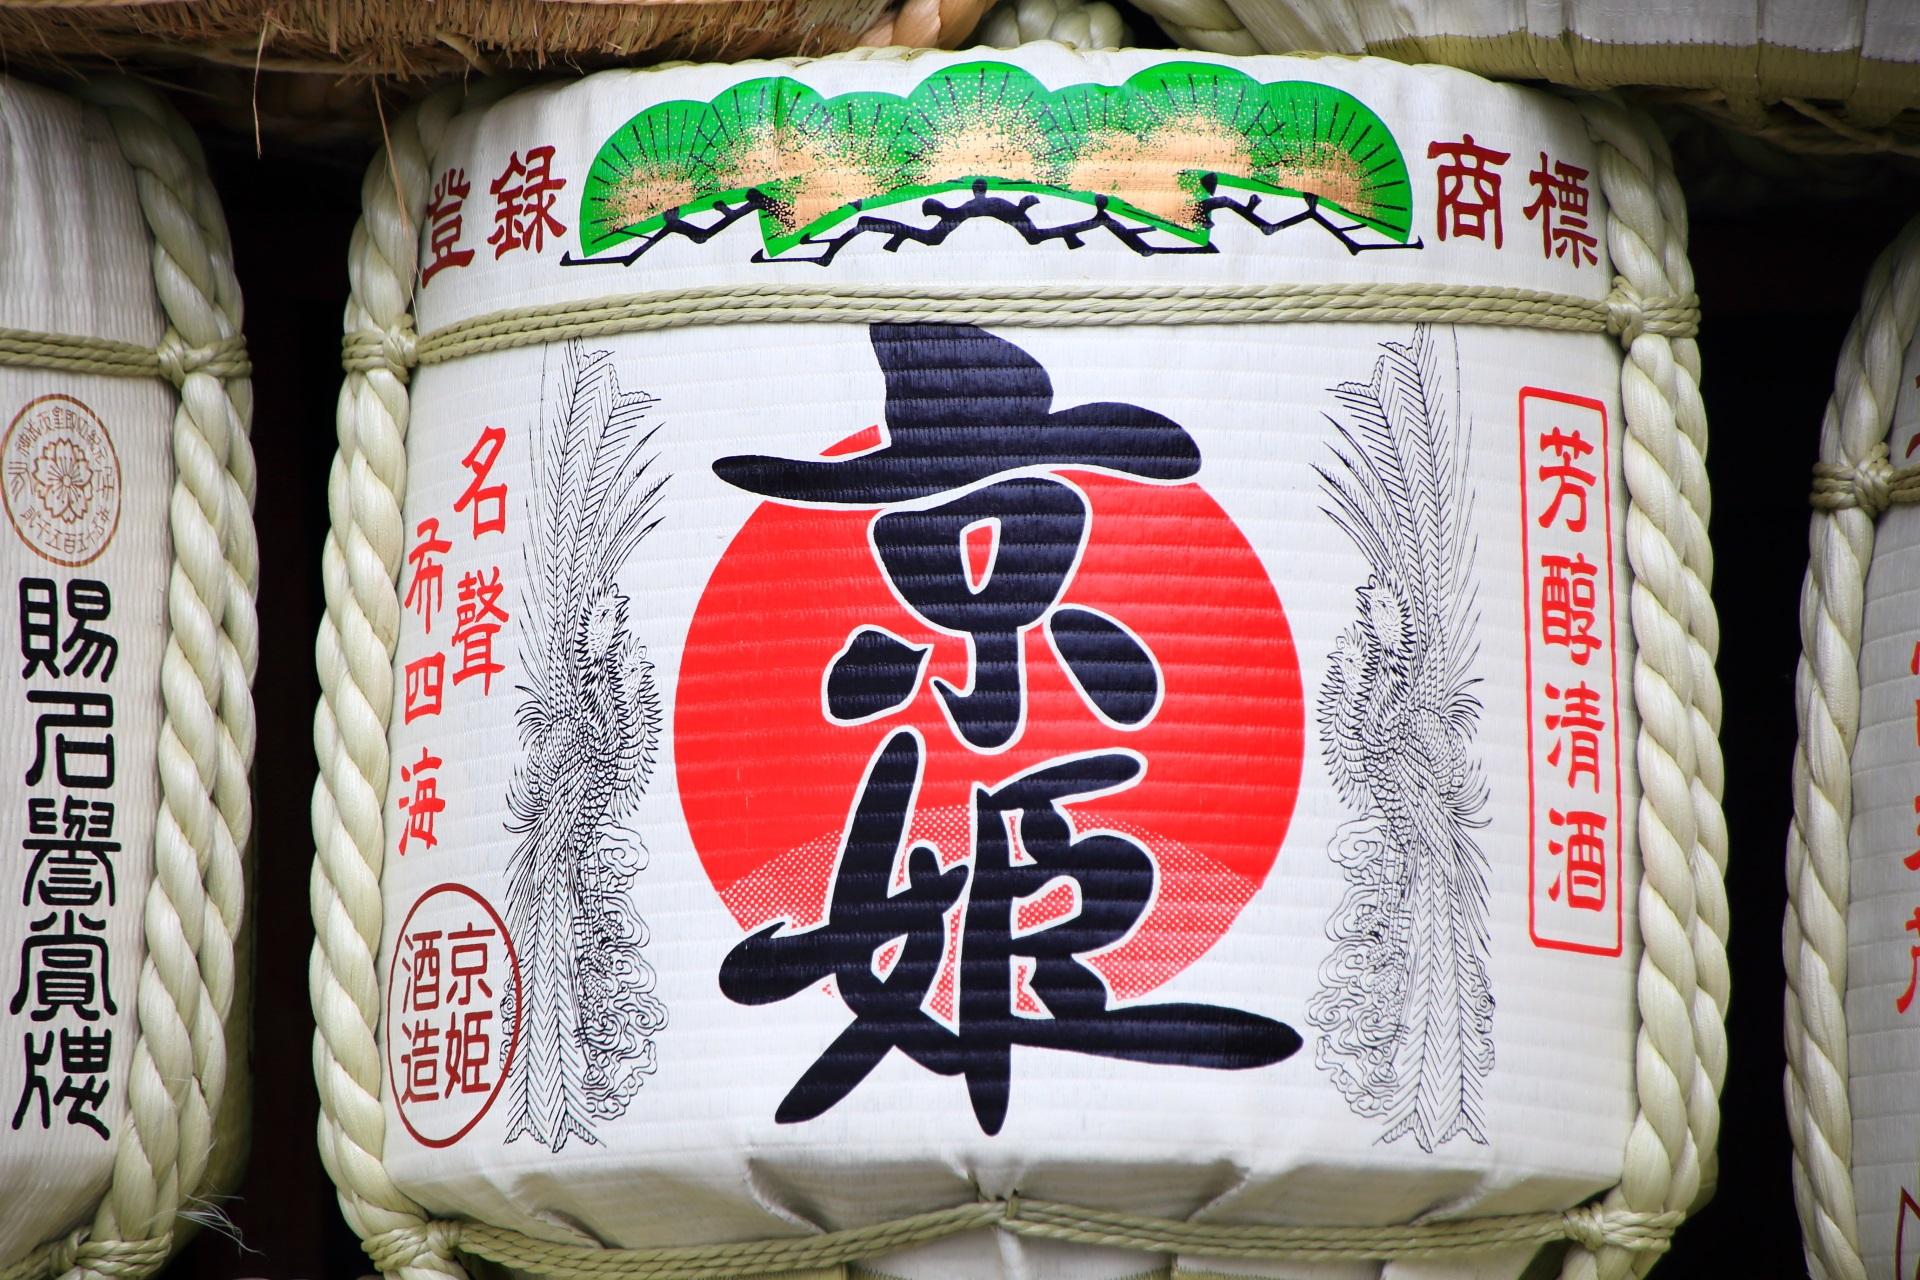 京姫 酒樽 松尾大社 お酒の神様